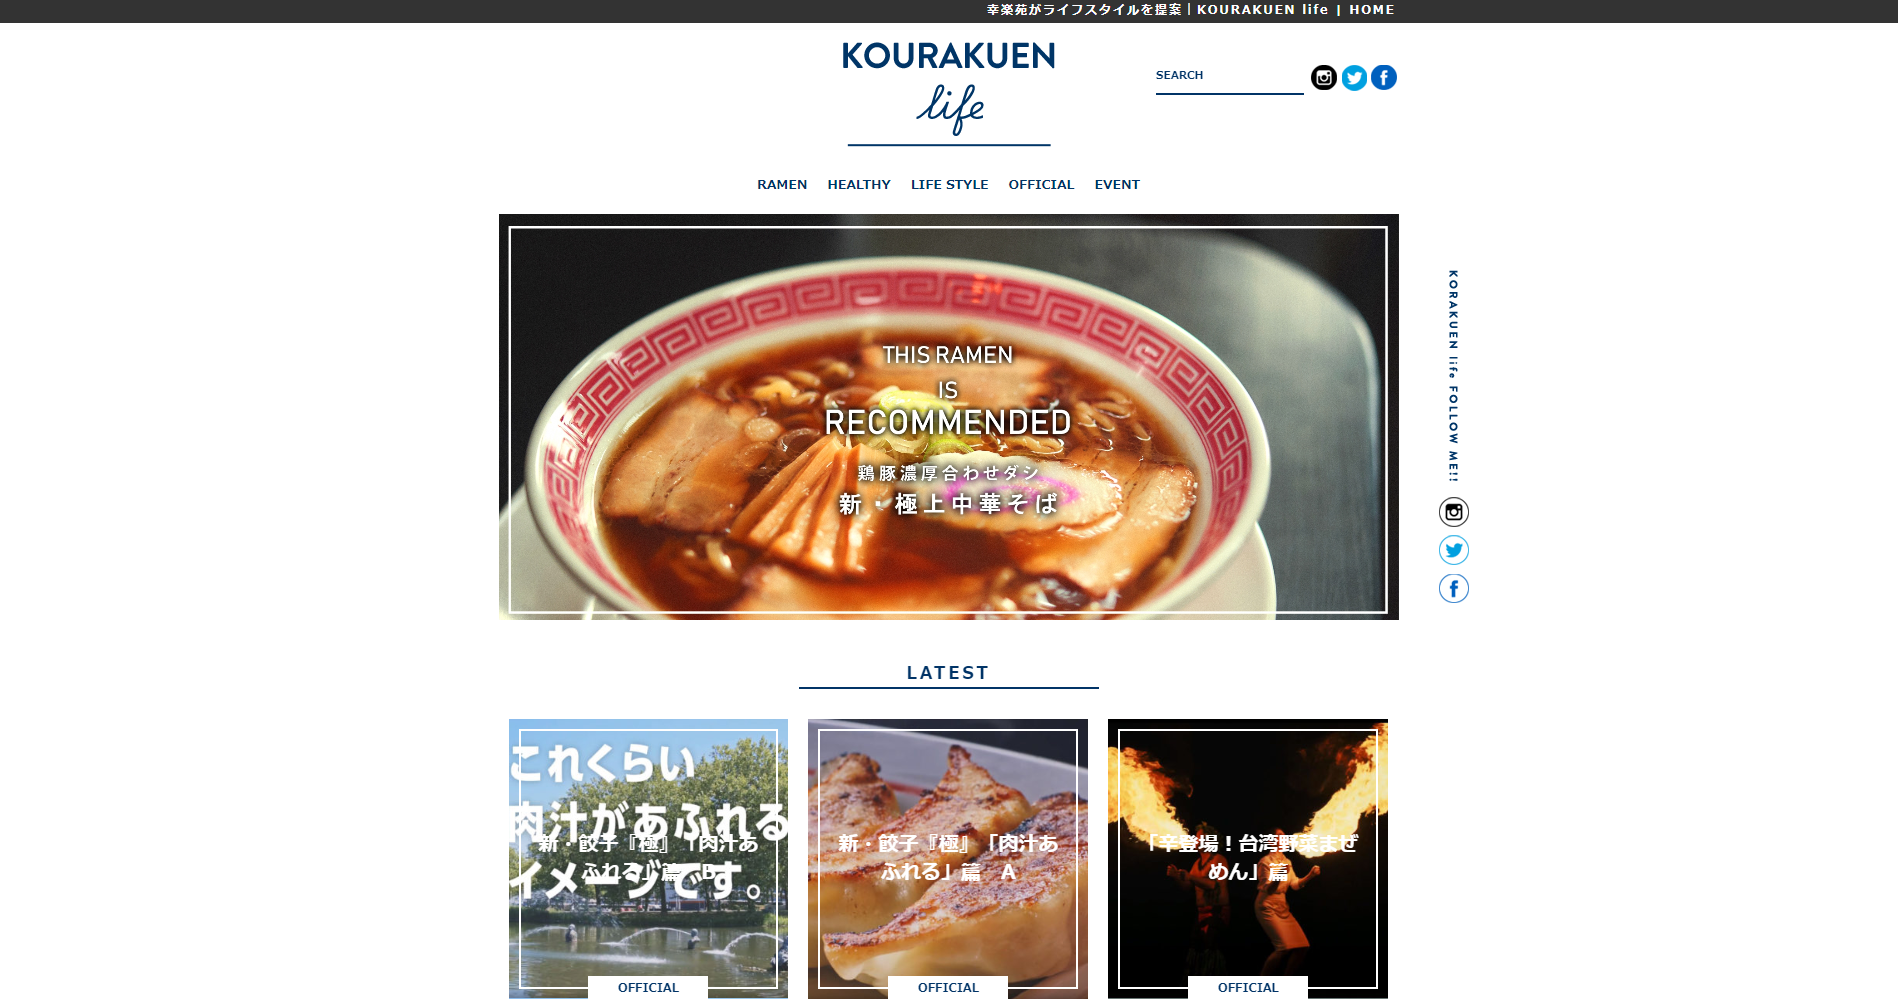 FireShot Capture 828 - 幸楽苑がライフスタイルを提案|KOURAKUEN life - https___www.kourakuen-life.com_